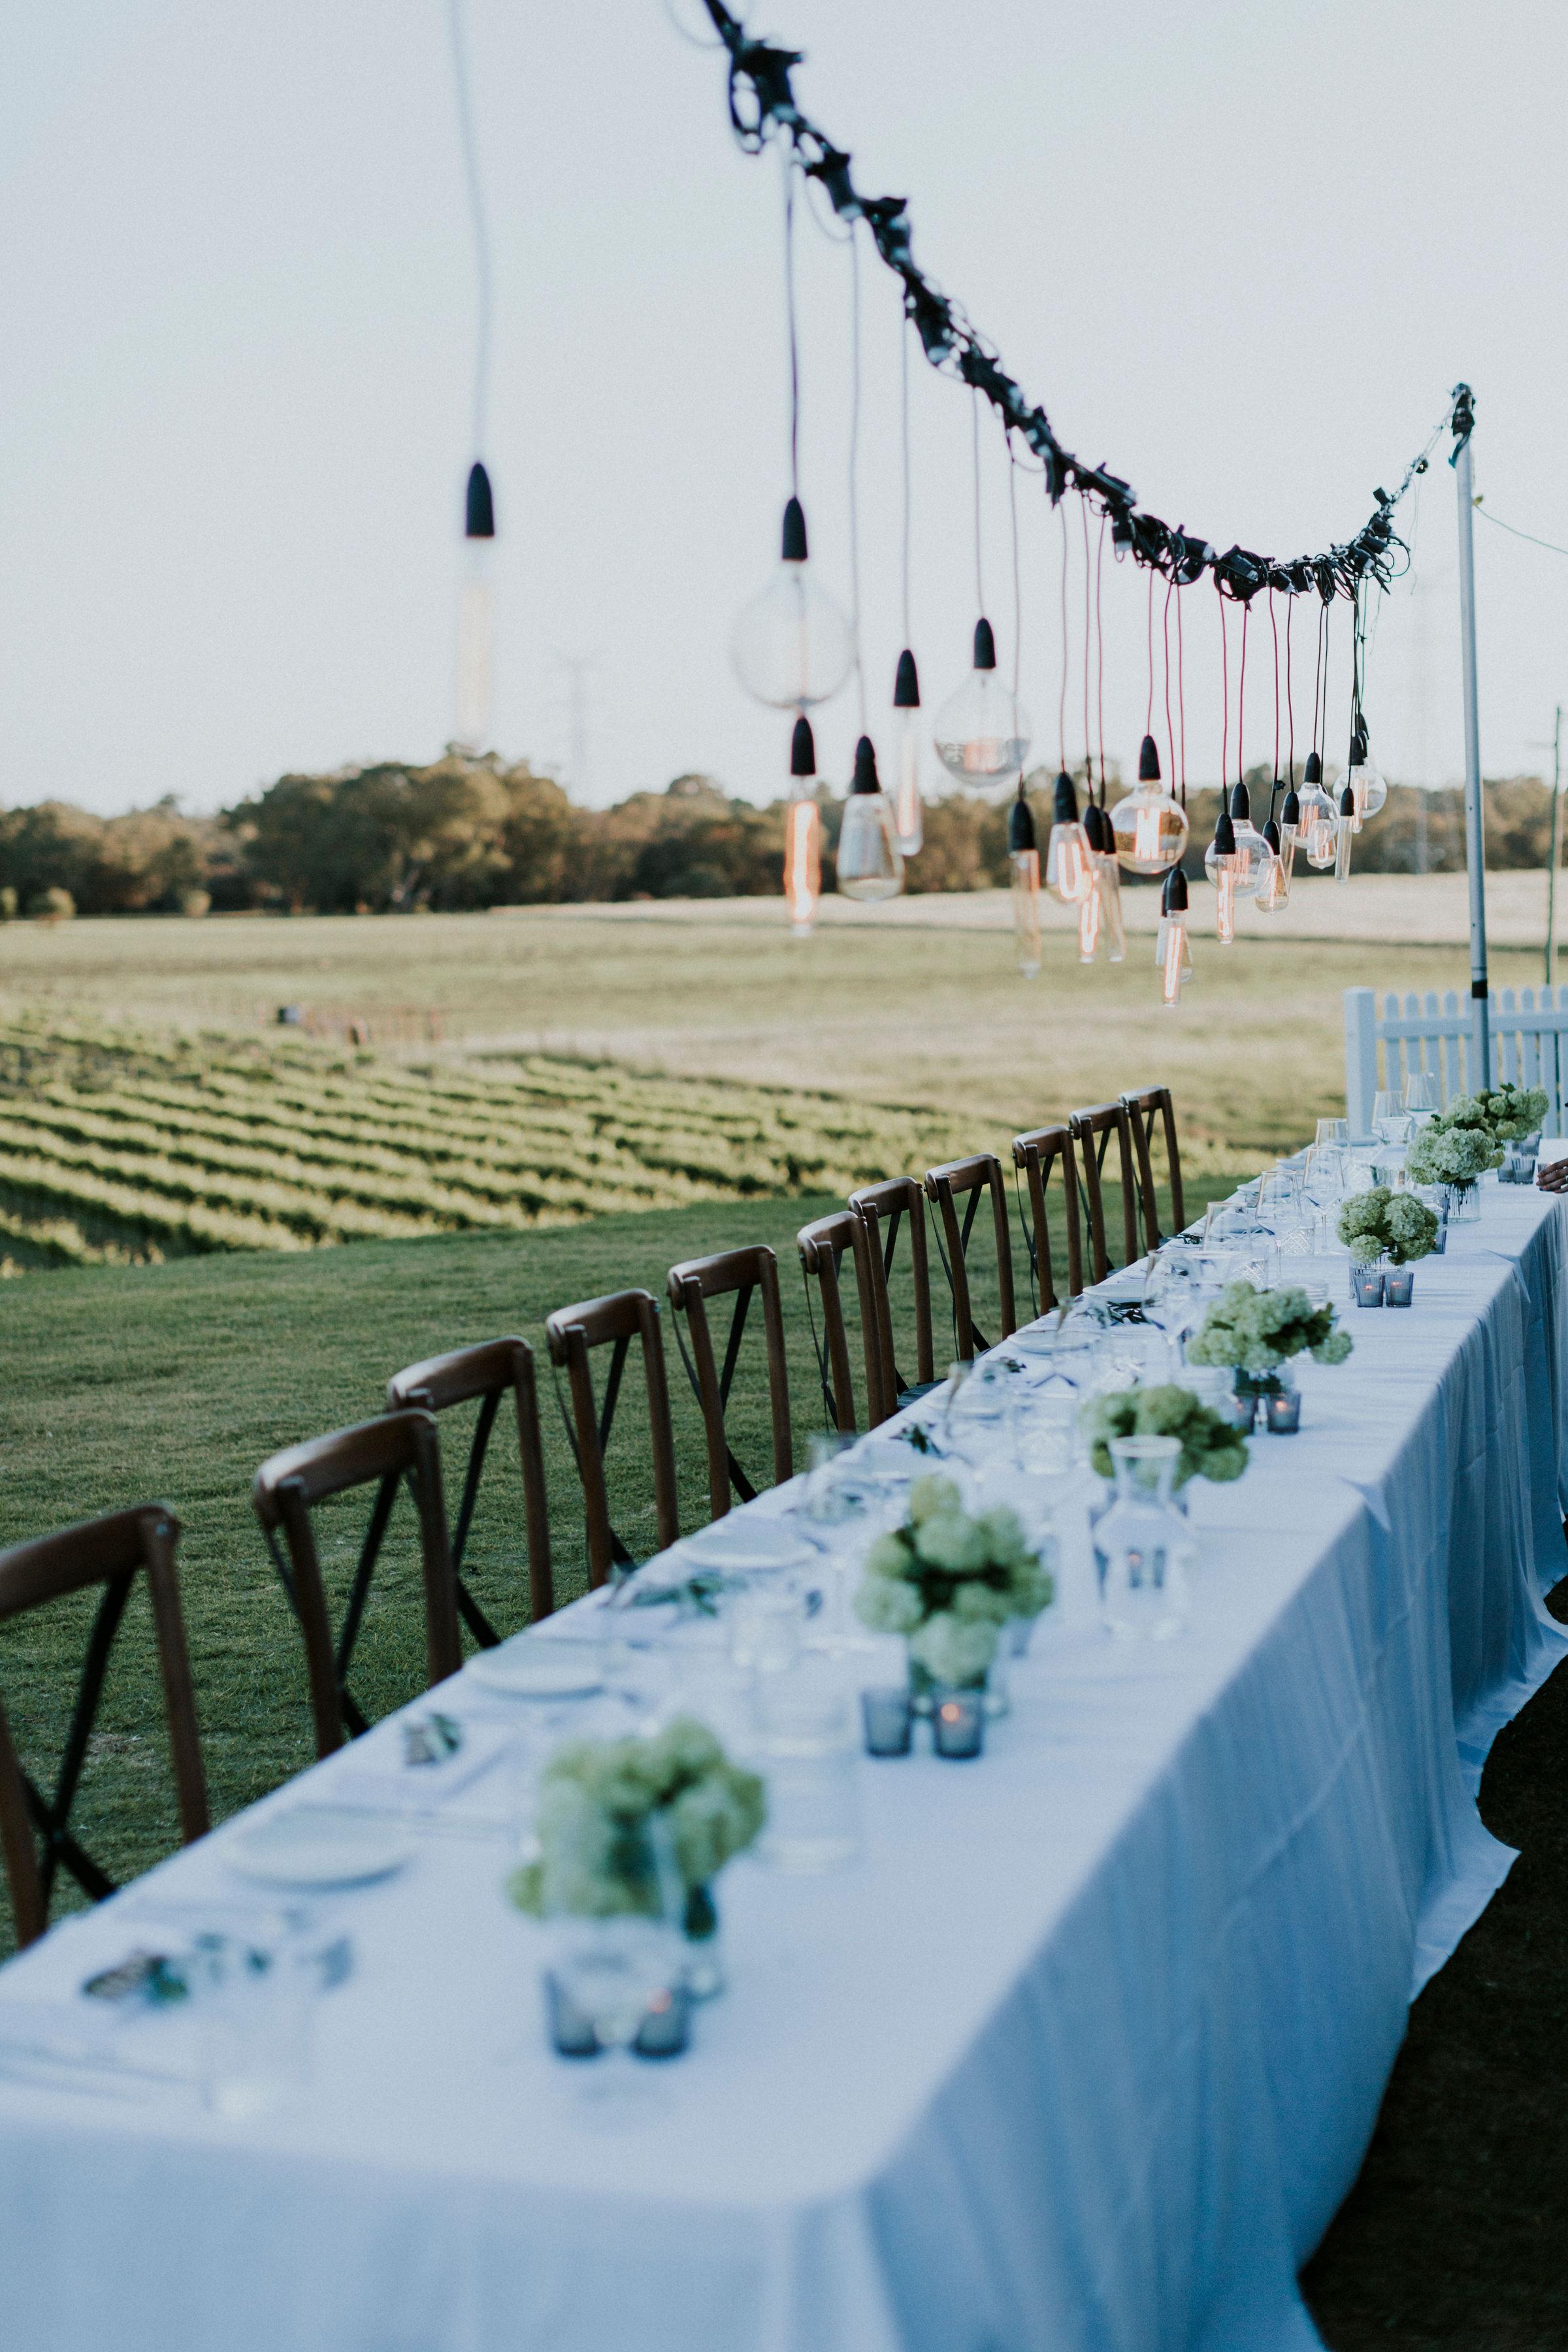 Perth Wedding Bridal Table